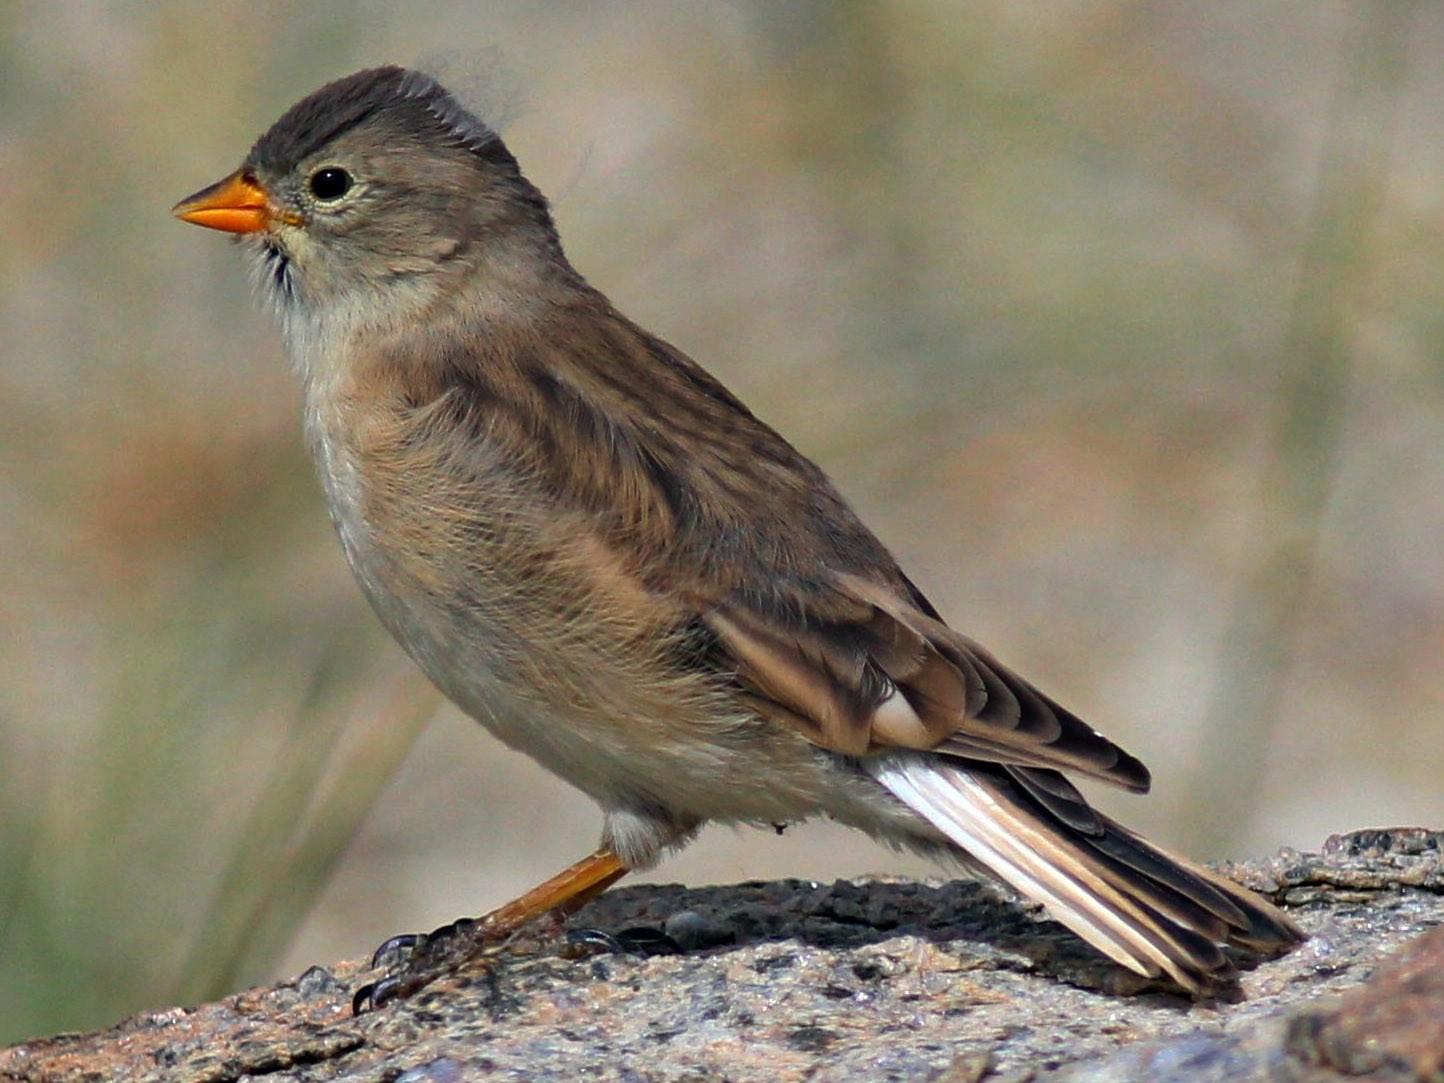 Black-winged Snowfinch - abhishek ravindra